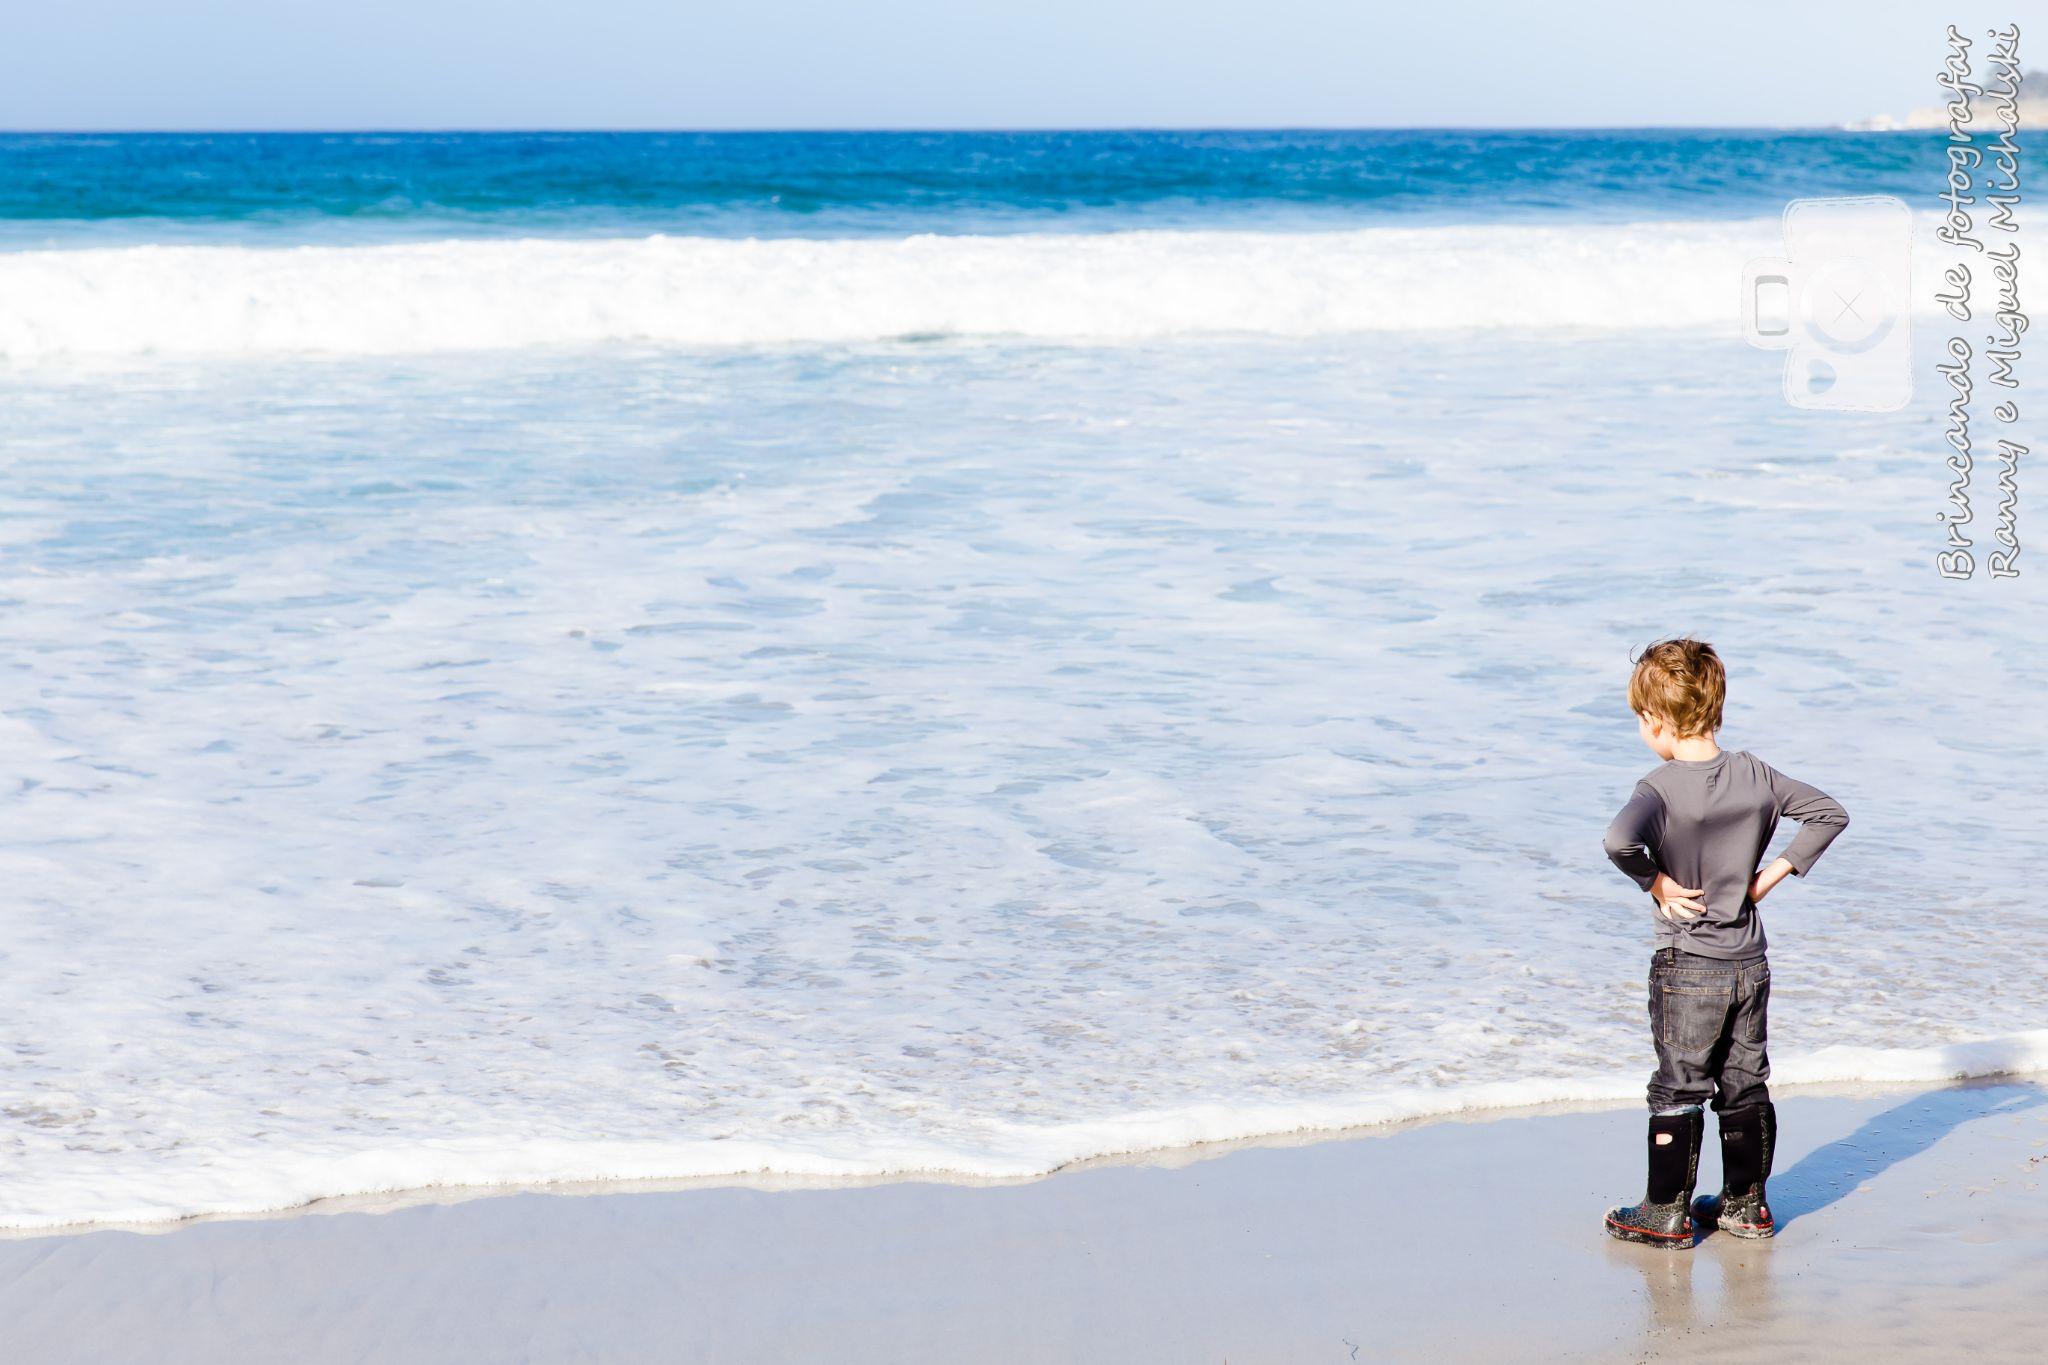 Kid on the beach by Ranny Michalski